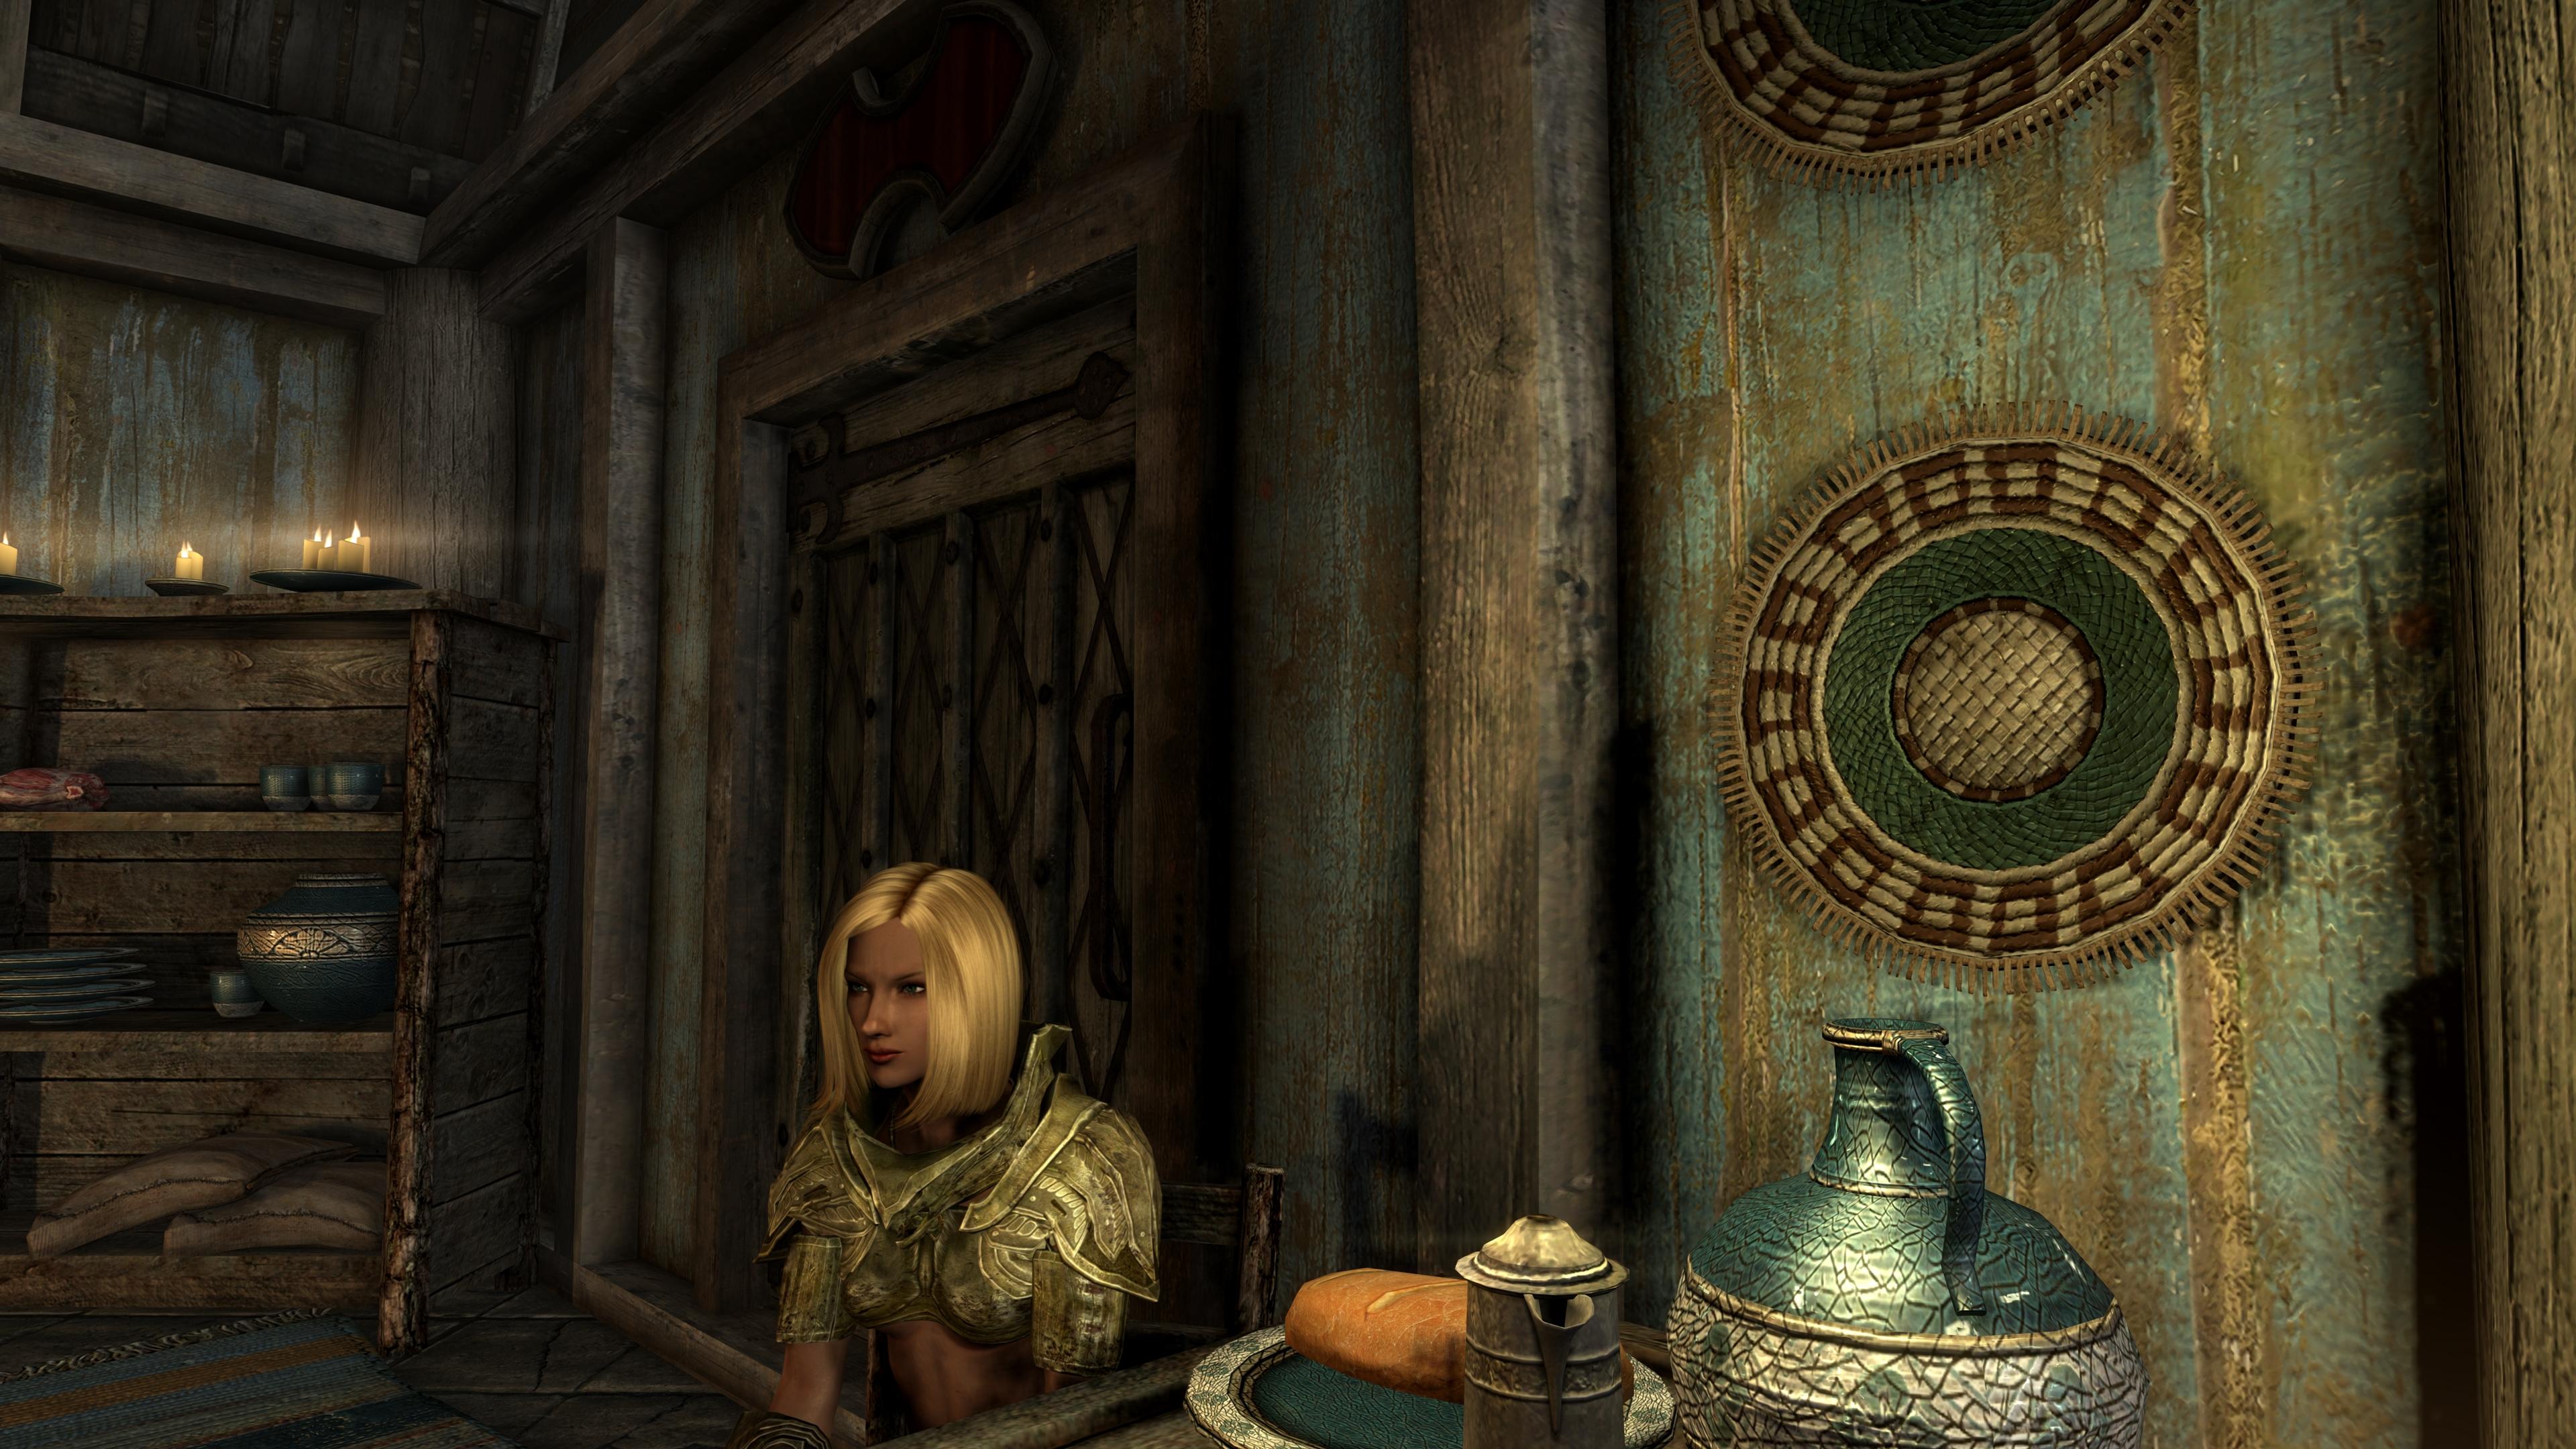 The Elder Scrolls V Skyrim Special Edition 4k ultra graphics - Elder Scrolls 5: Skyrim, the